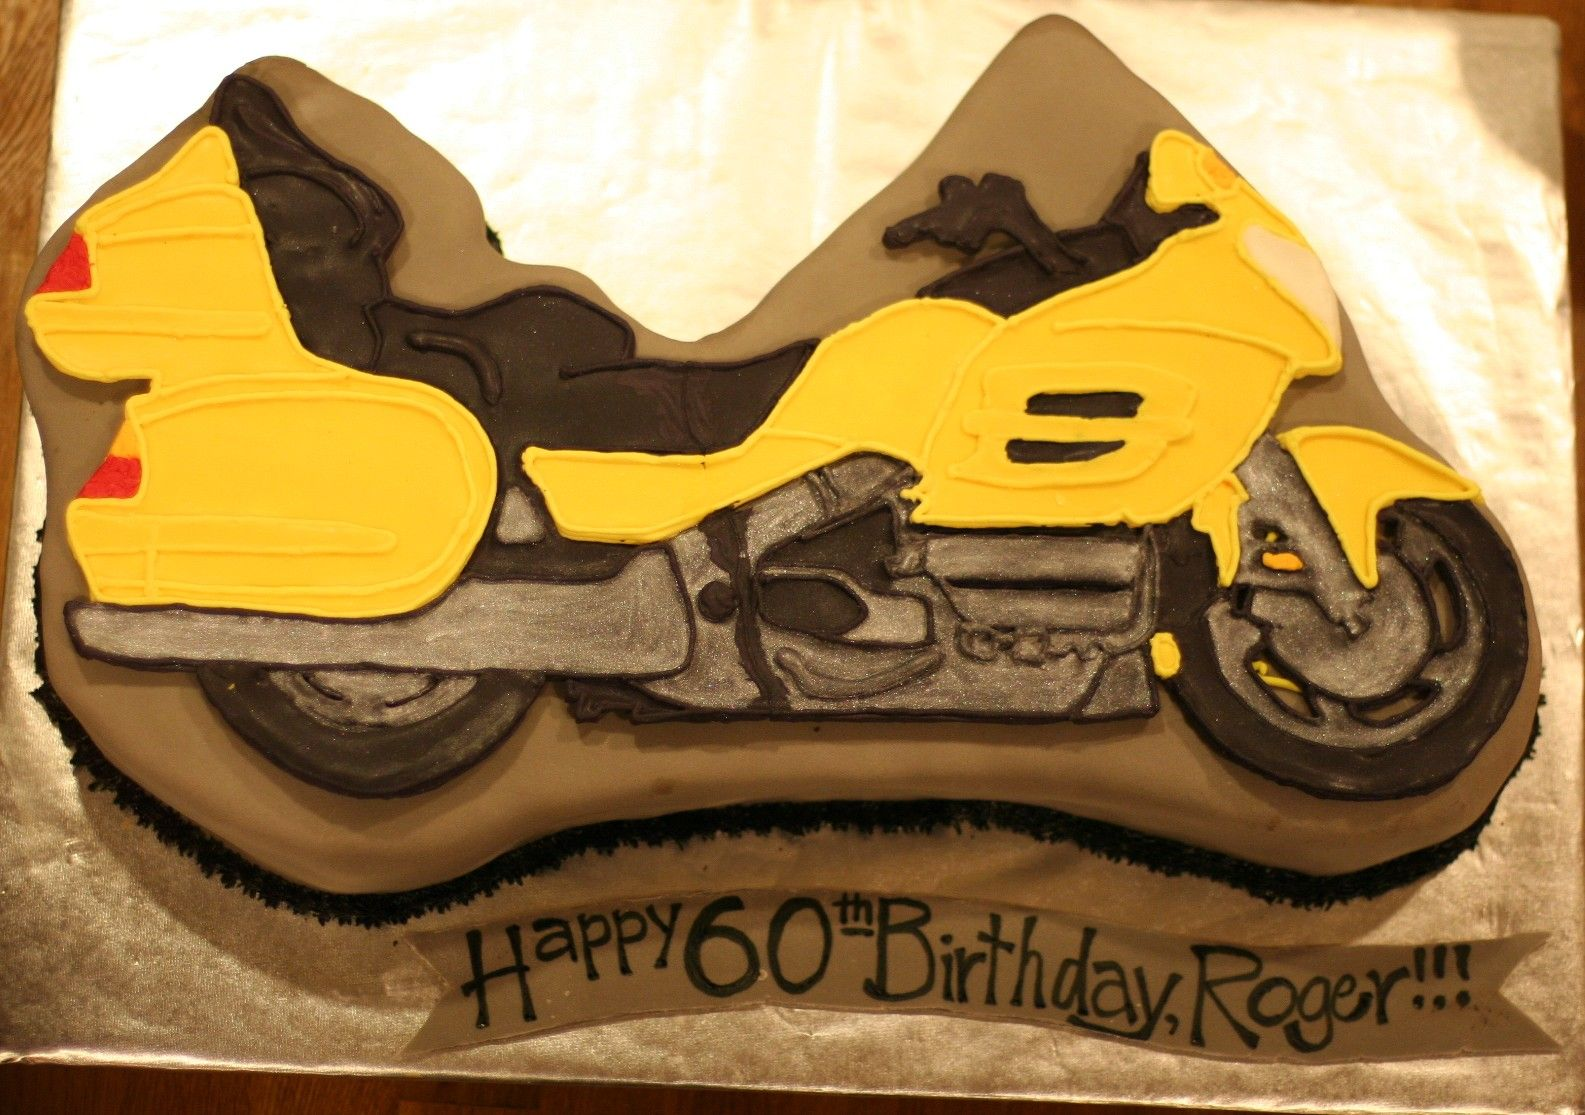 Honda Goldwing Birthday Cake